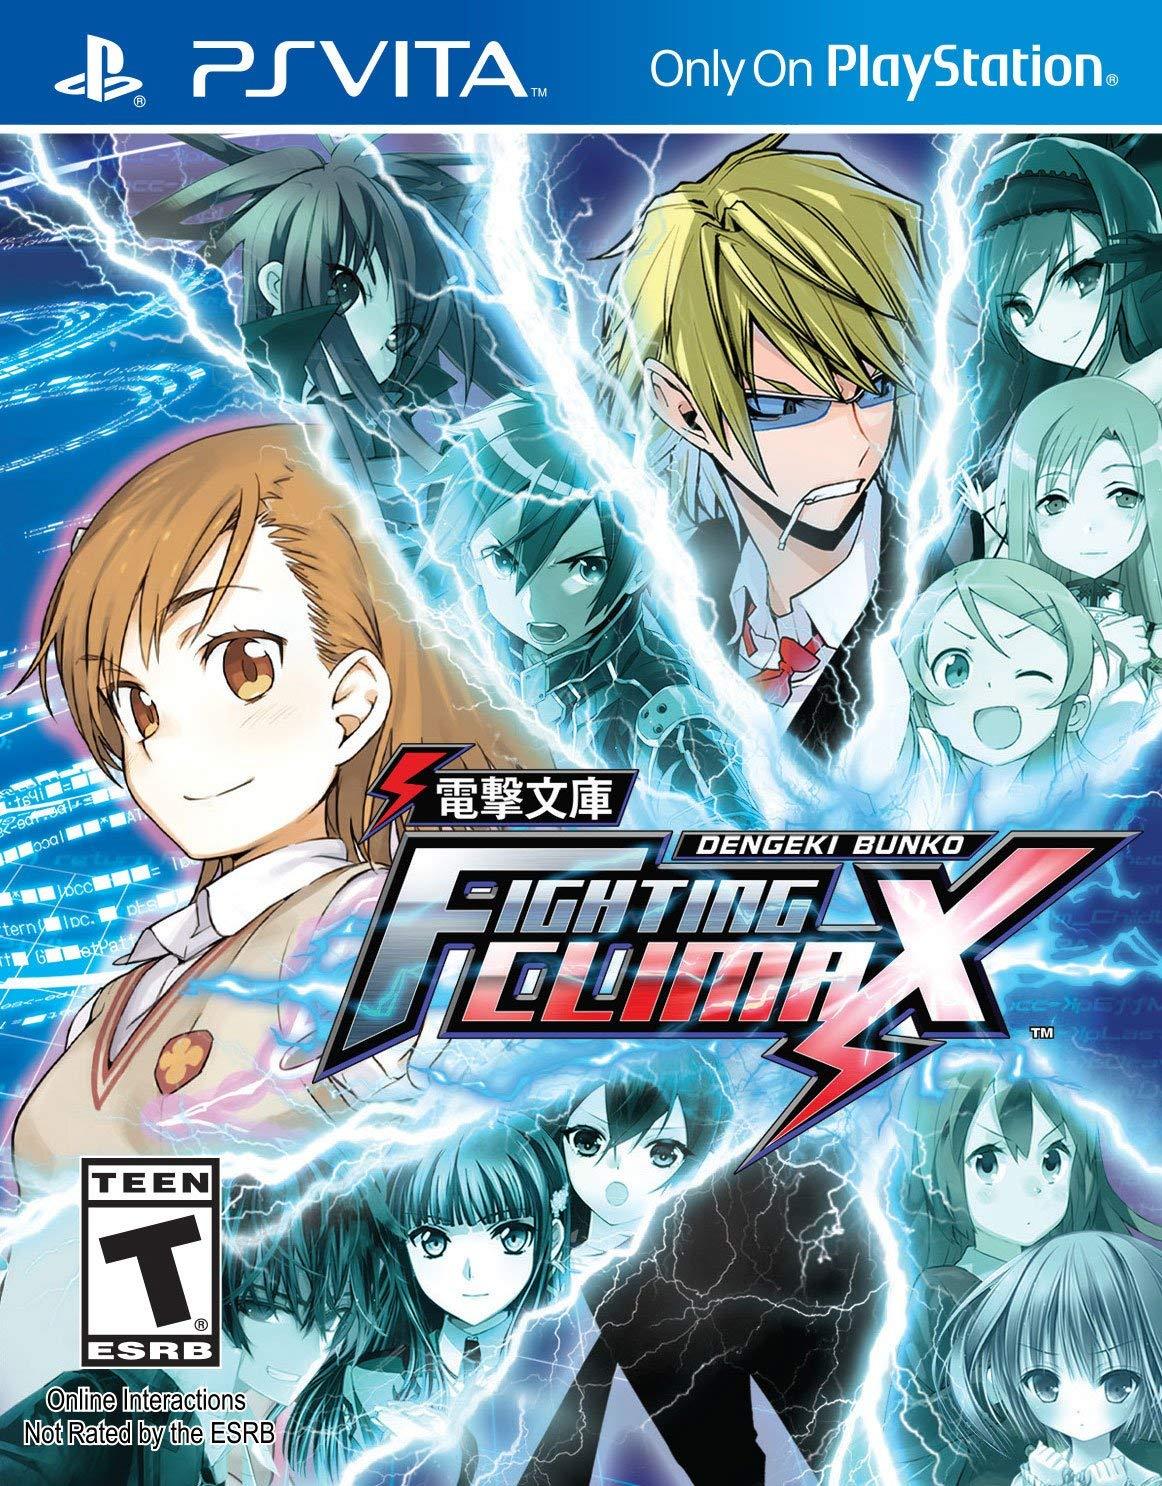 Dengeki Bunko: Fighting Climax - PlayStation Vita